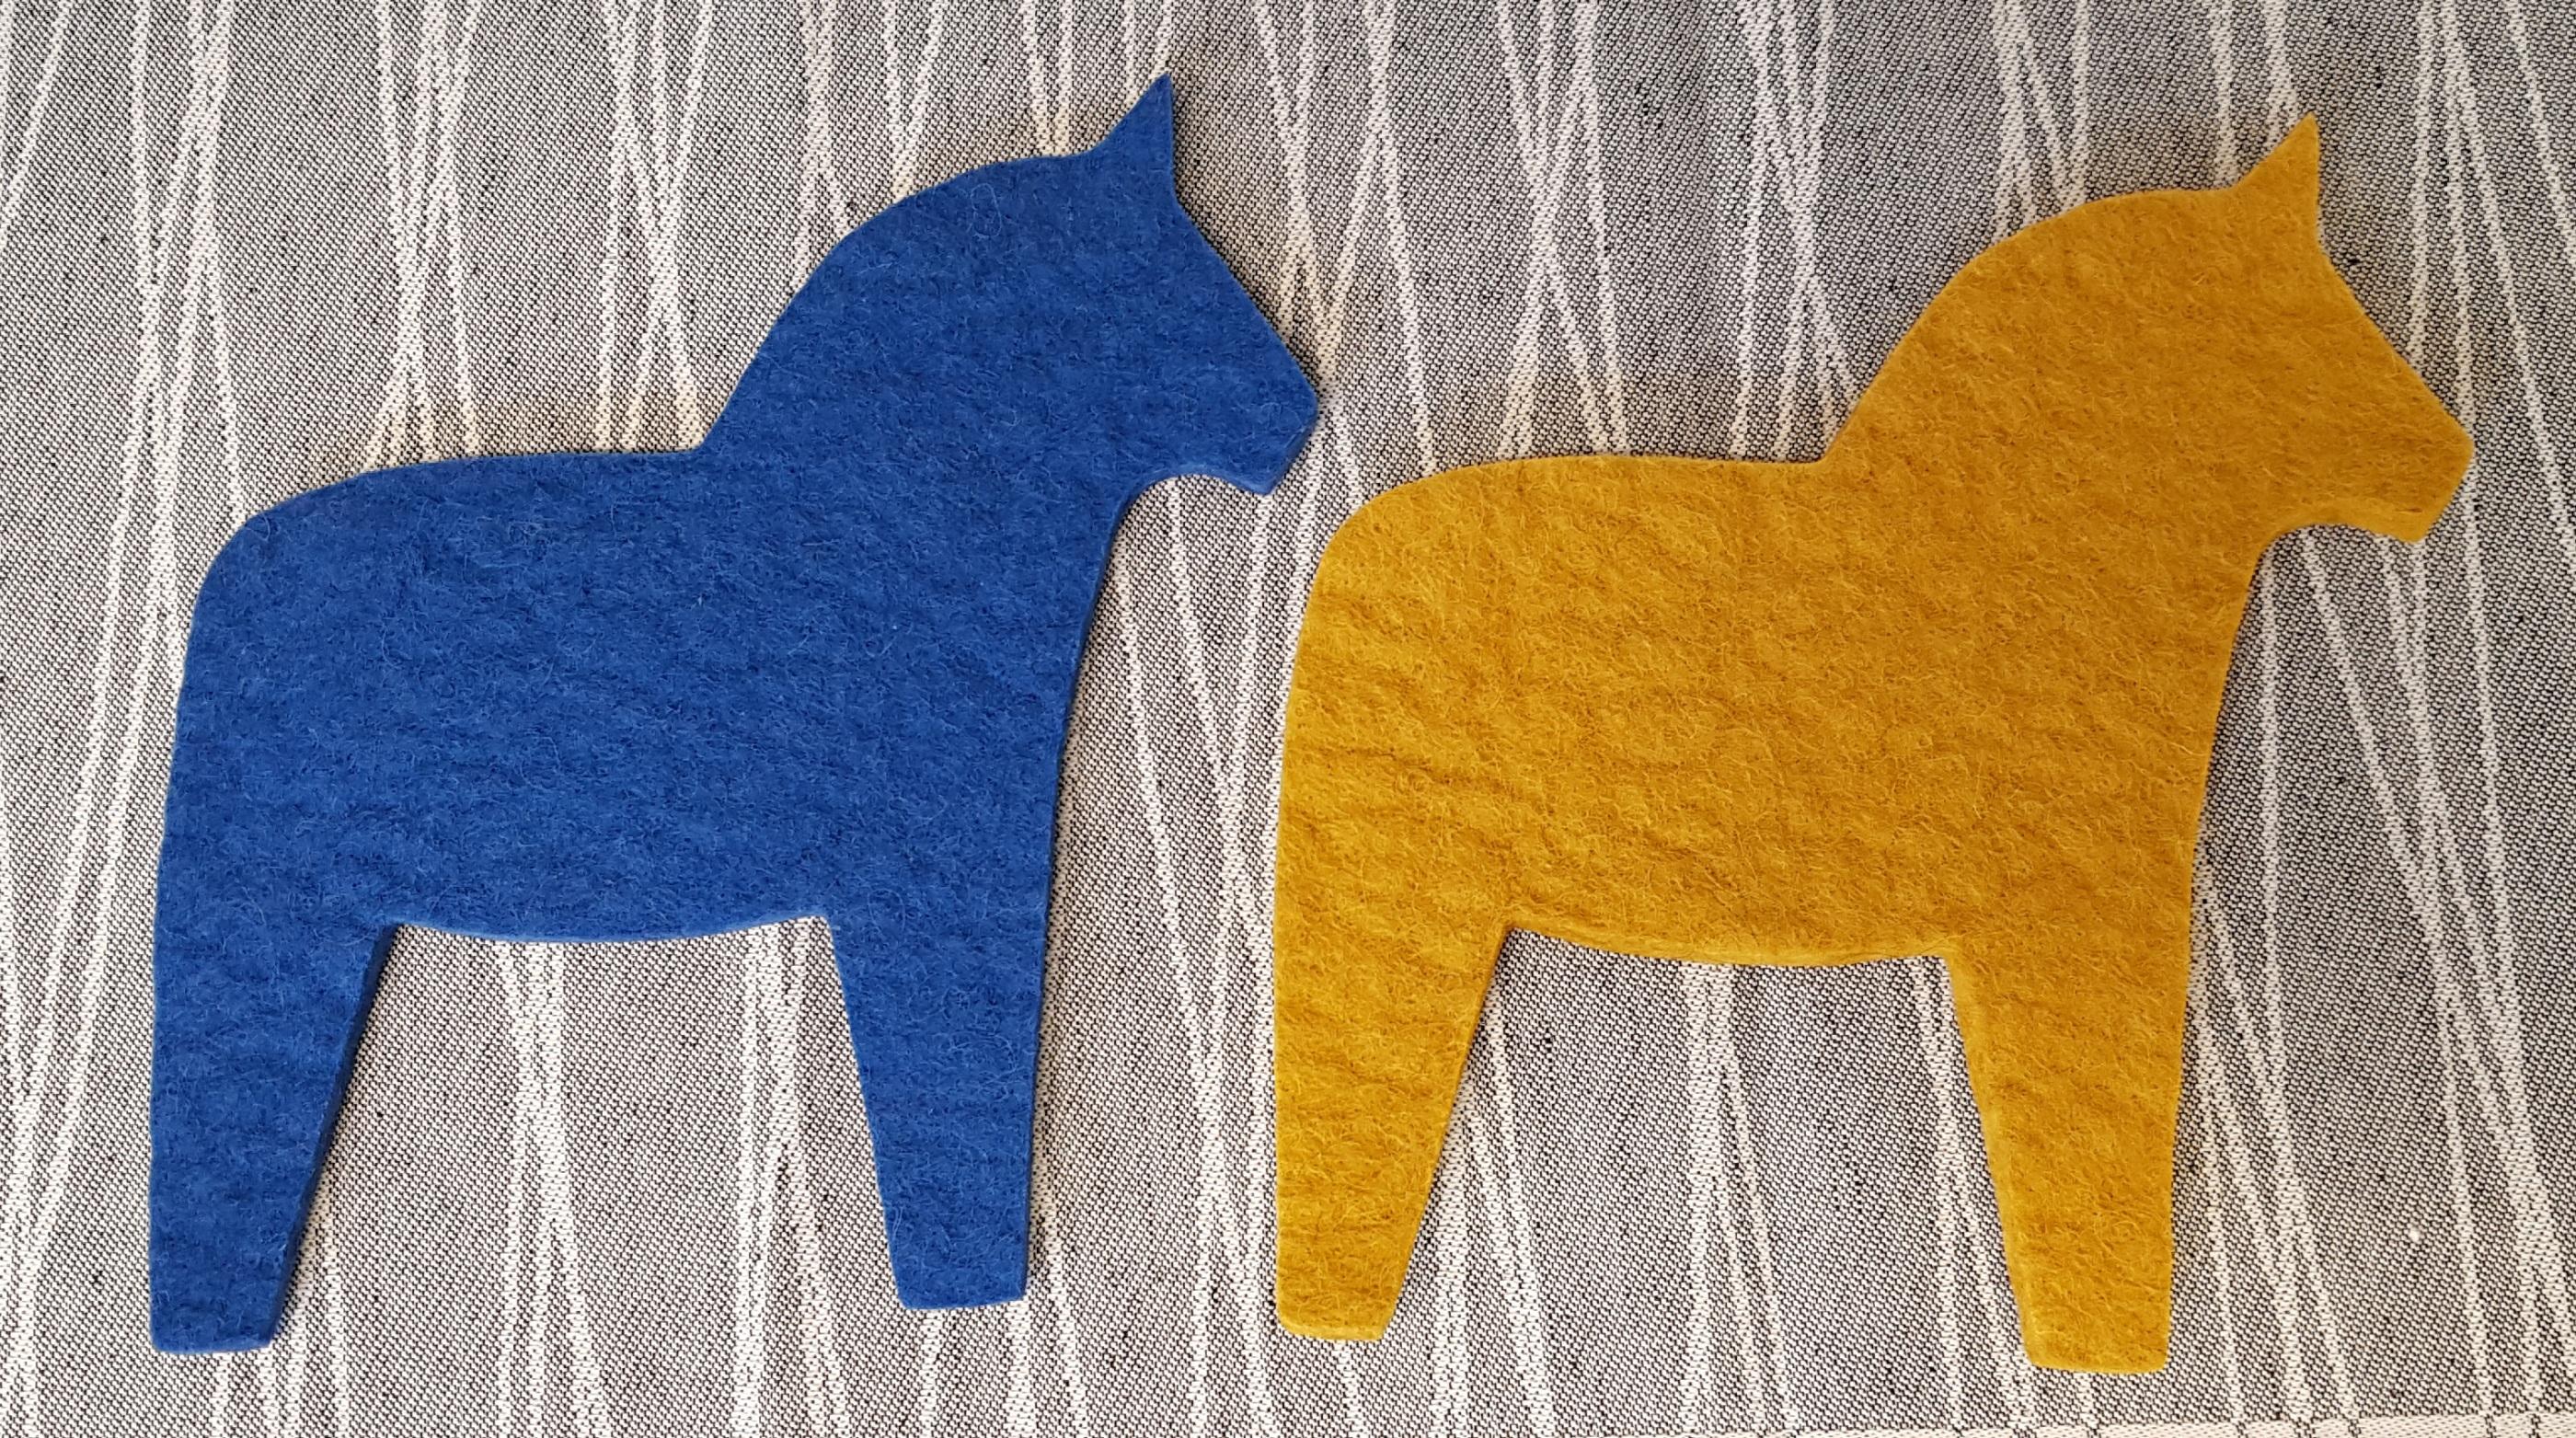 gul-blå-dalahäst-ullcentrum